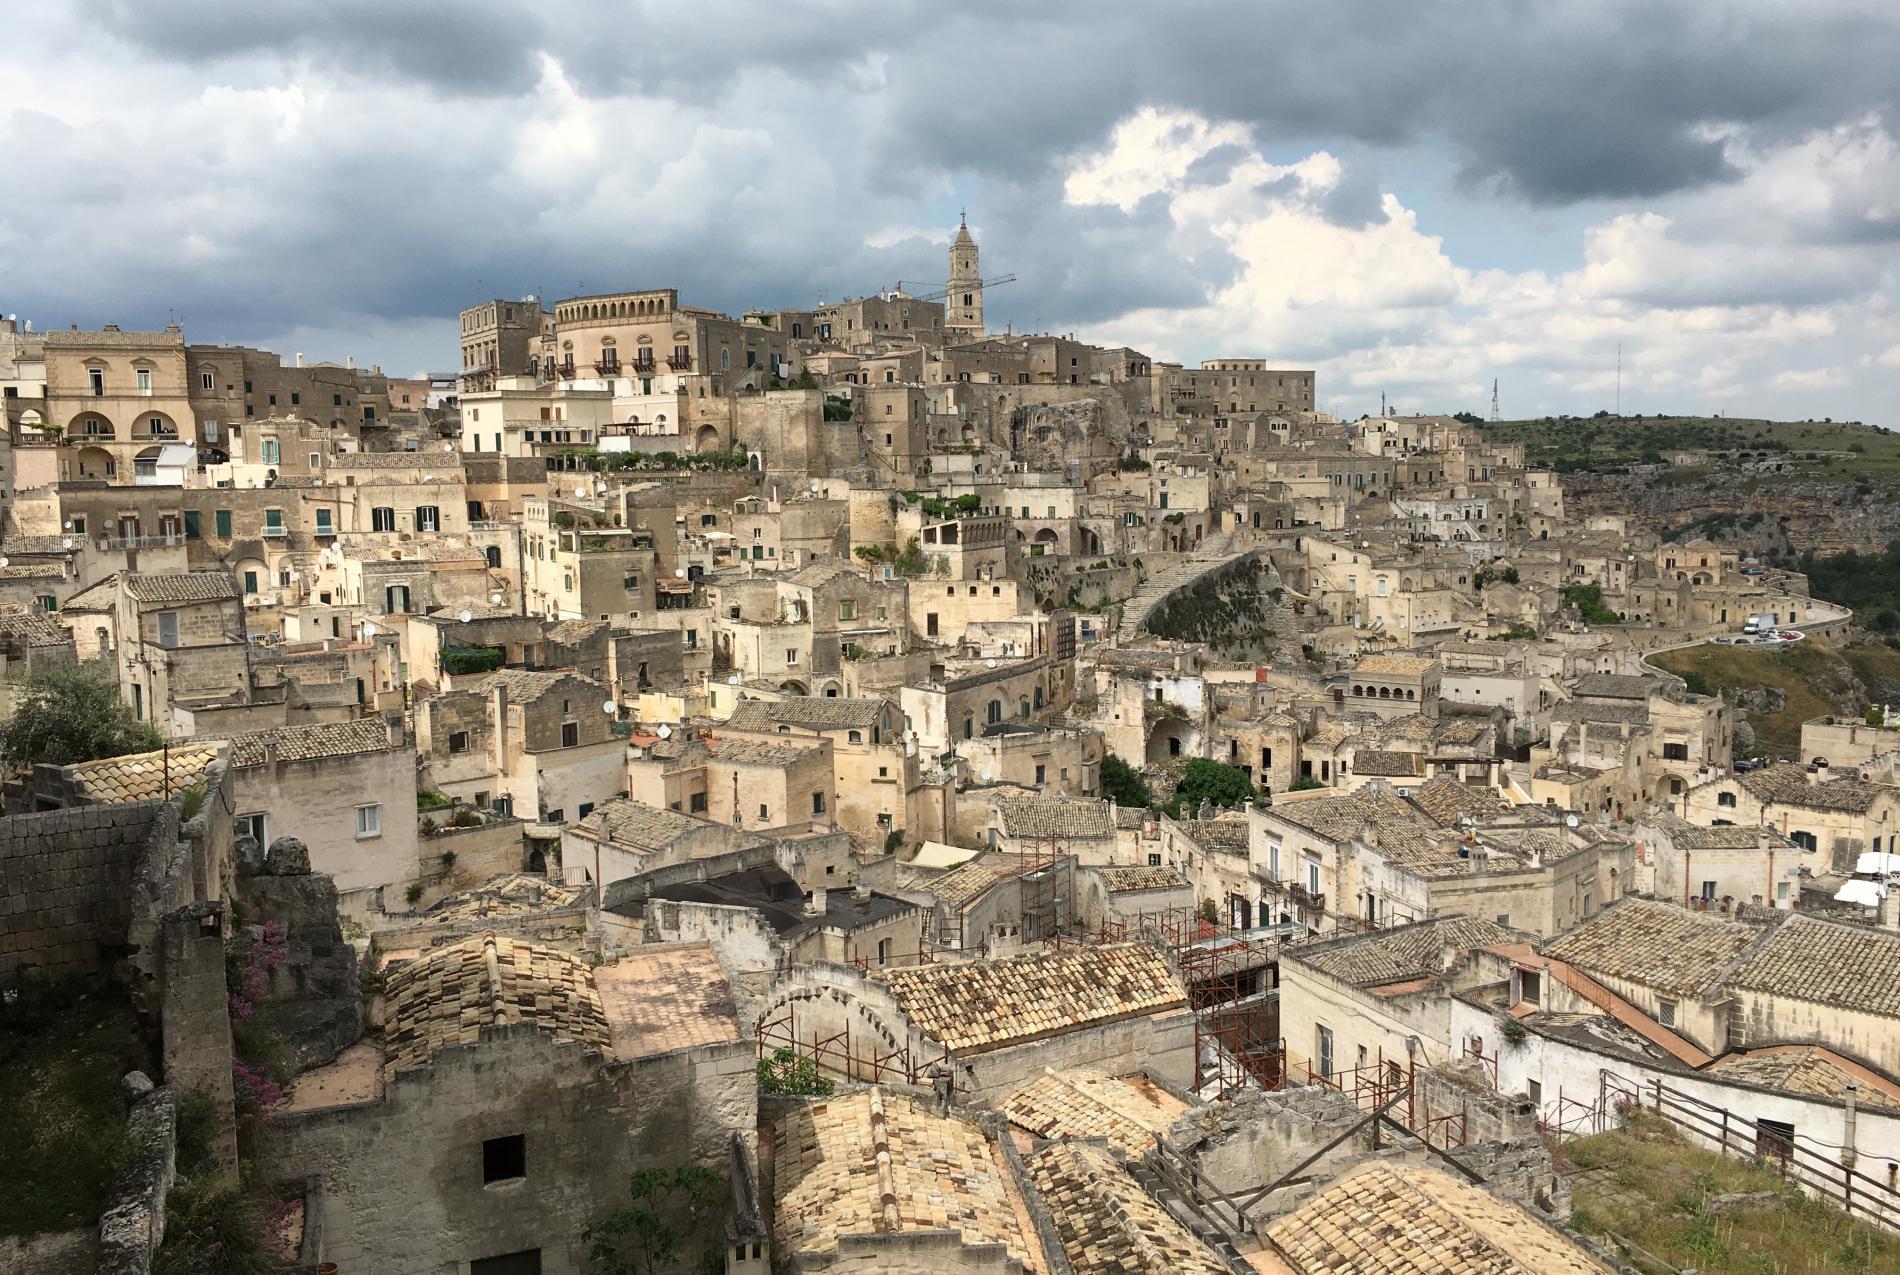 Voyage solidaire Italie : Vision du Monde - Photo 5